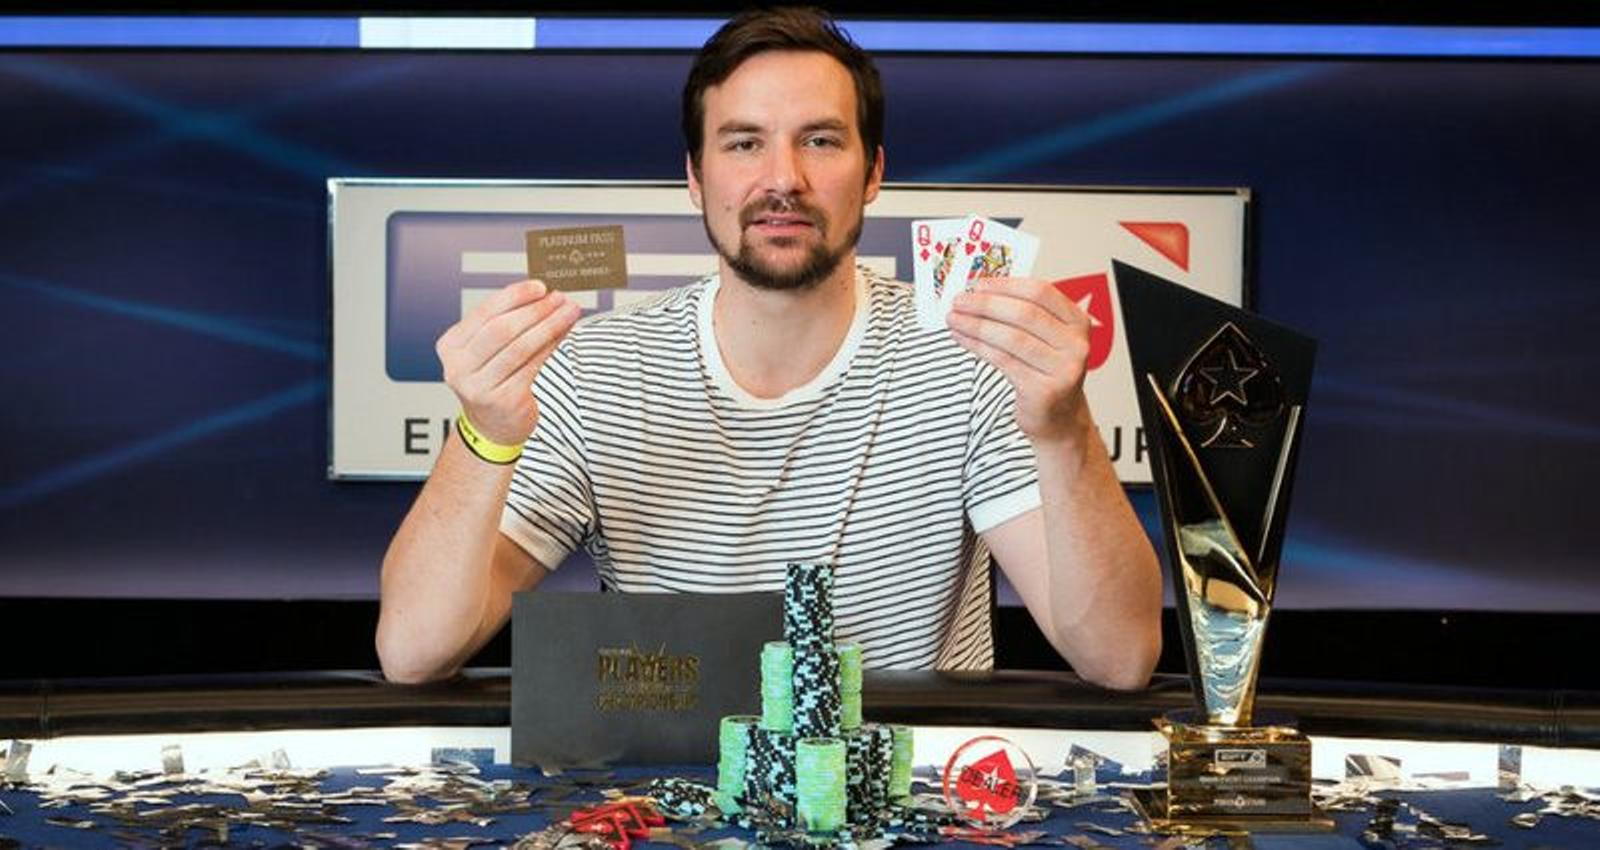 Nicolas Dumont Gewinner der EPT 2018